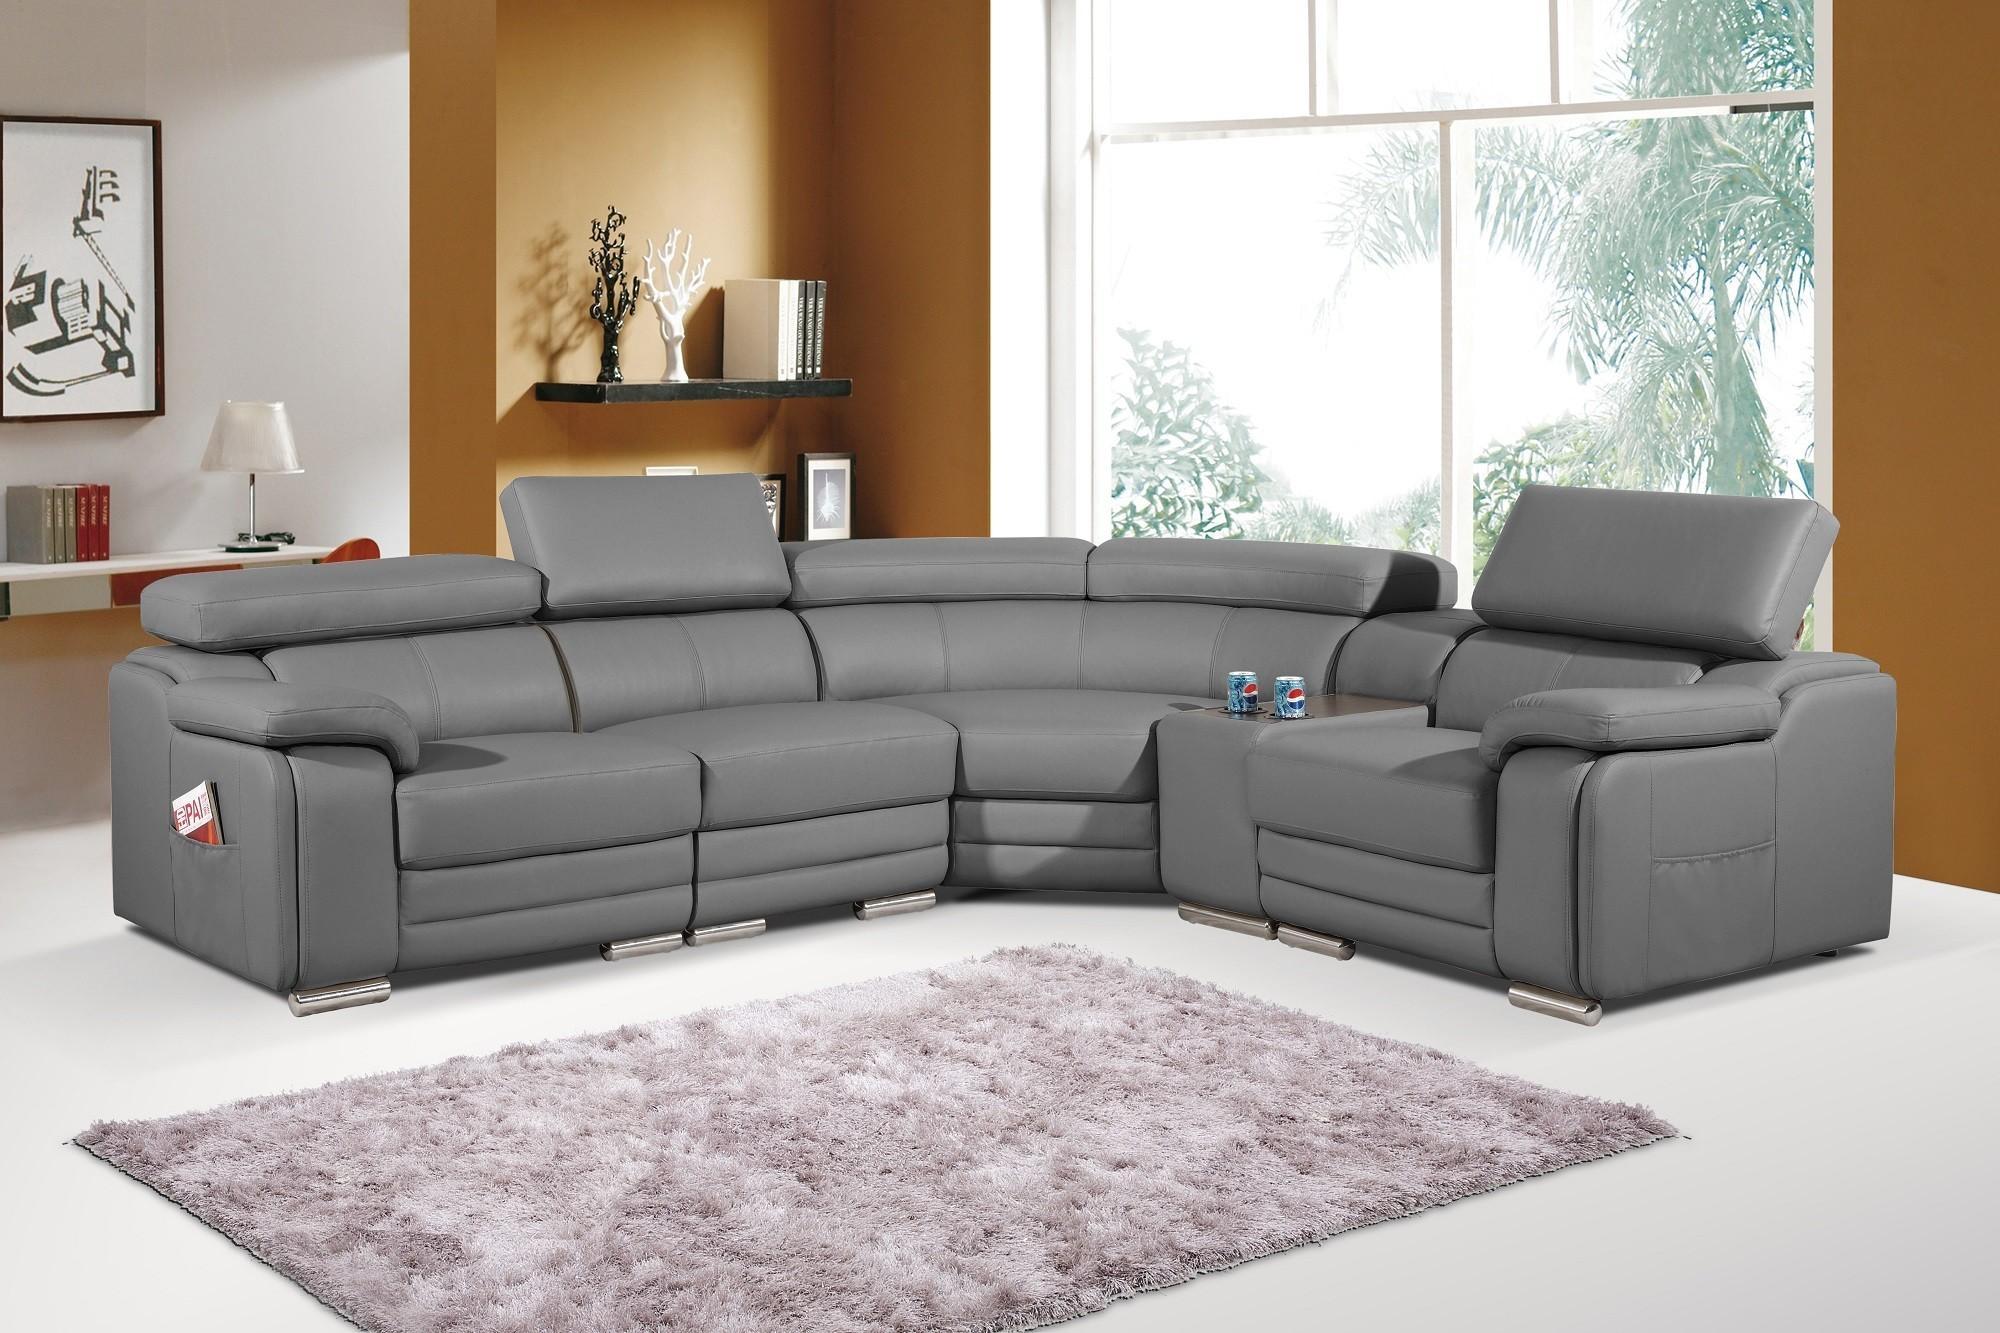 Sofas Center : Leather Corner Sofas Sofa Uk Clearanceleather Within Leather Corner Sofas (Image 19 of 20)